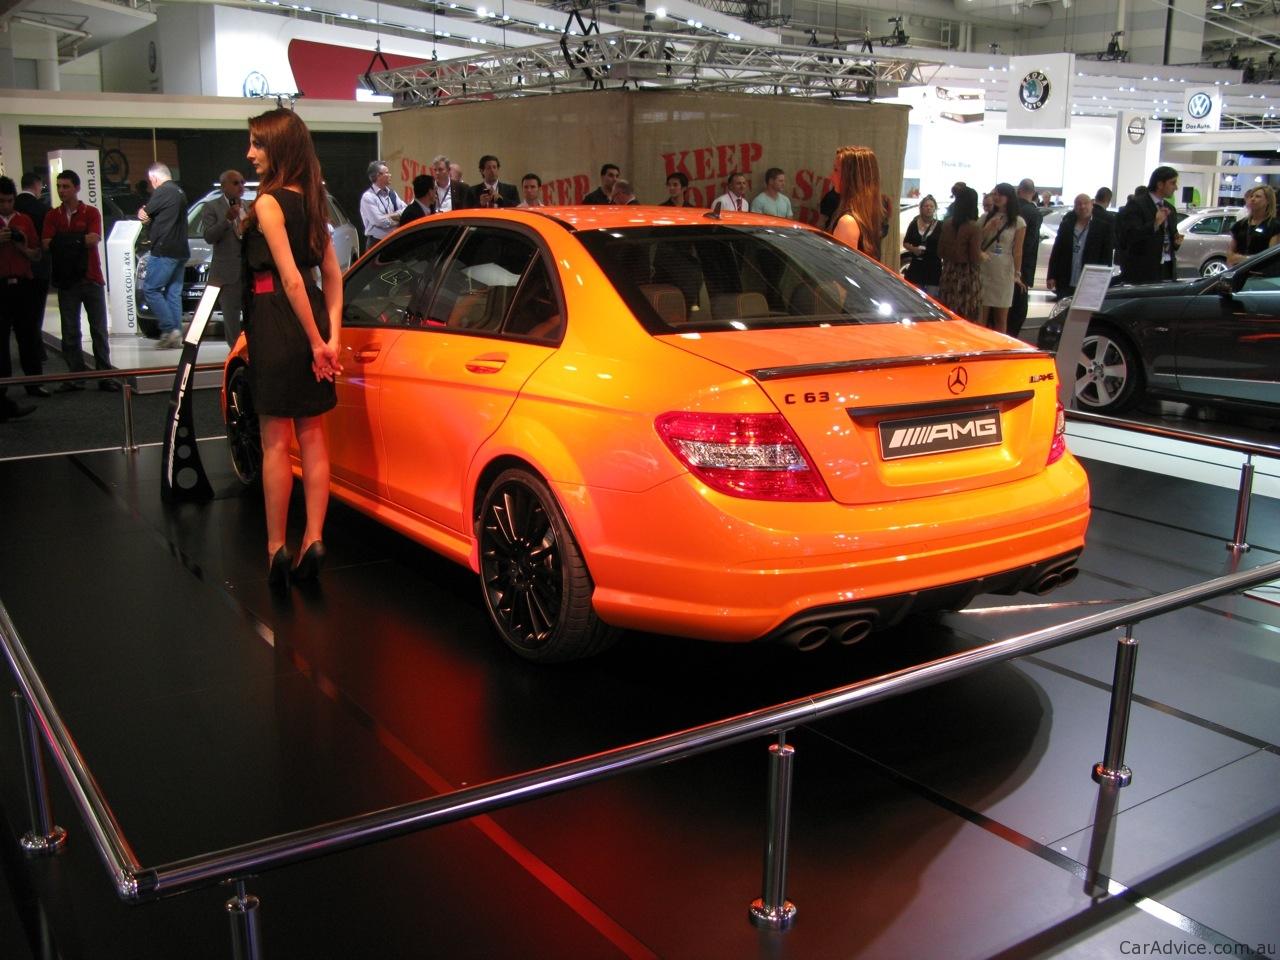 Toyota Long Island >> Mercedes-Benz C63 AMG Orange at 2010 AIMS - photos   CarAdvice